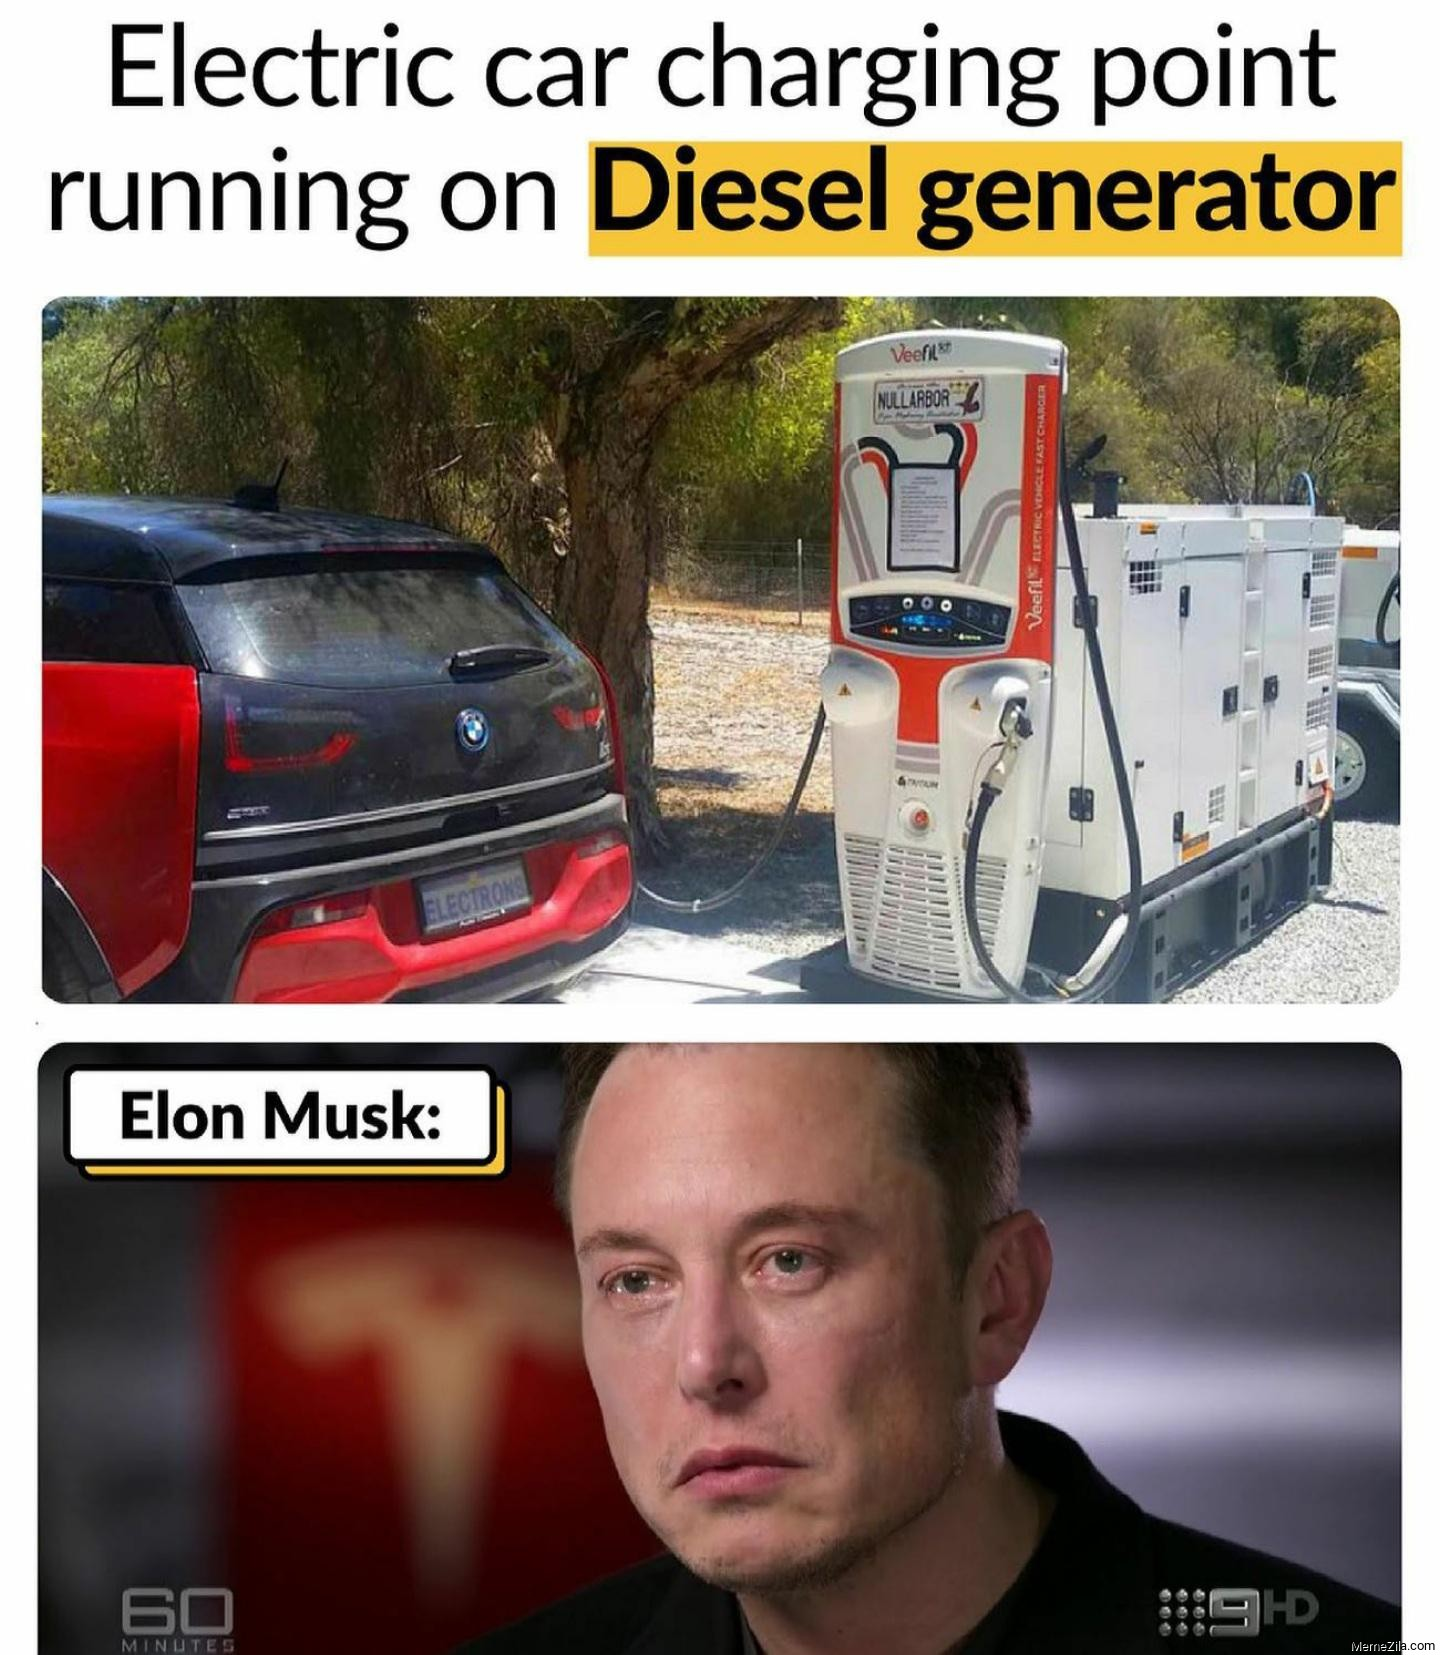 Electric car charging point running on diesel generator meanwhile Elon Musk meme